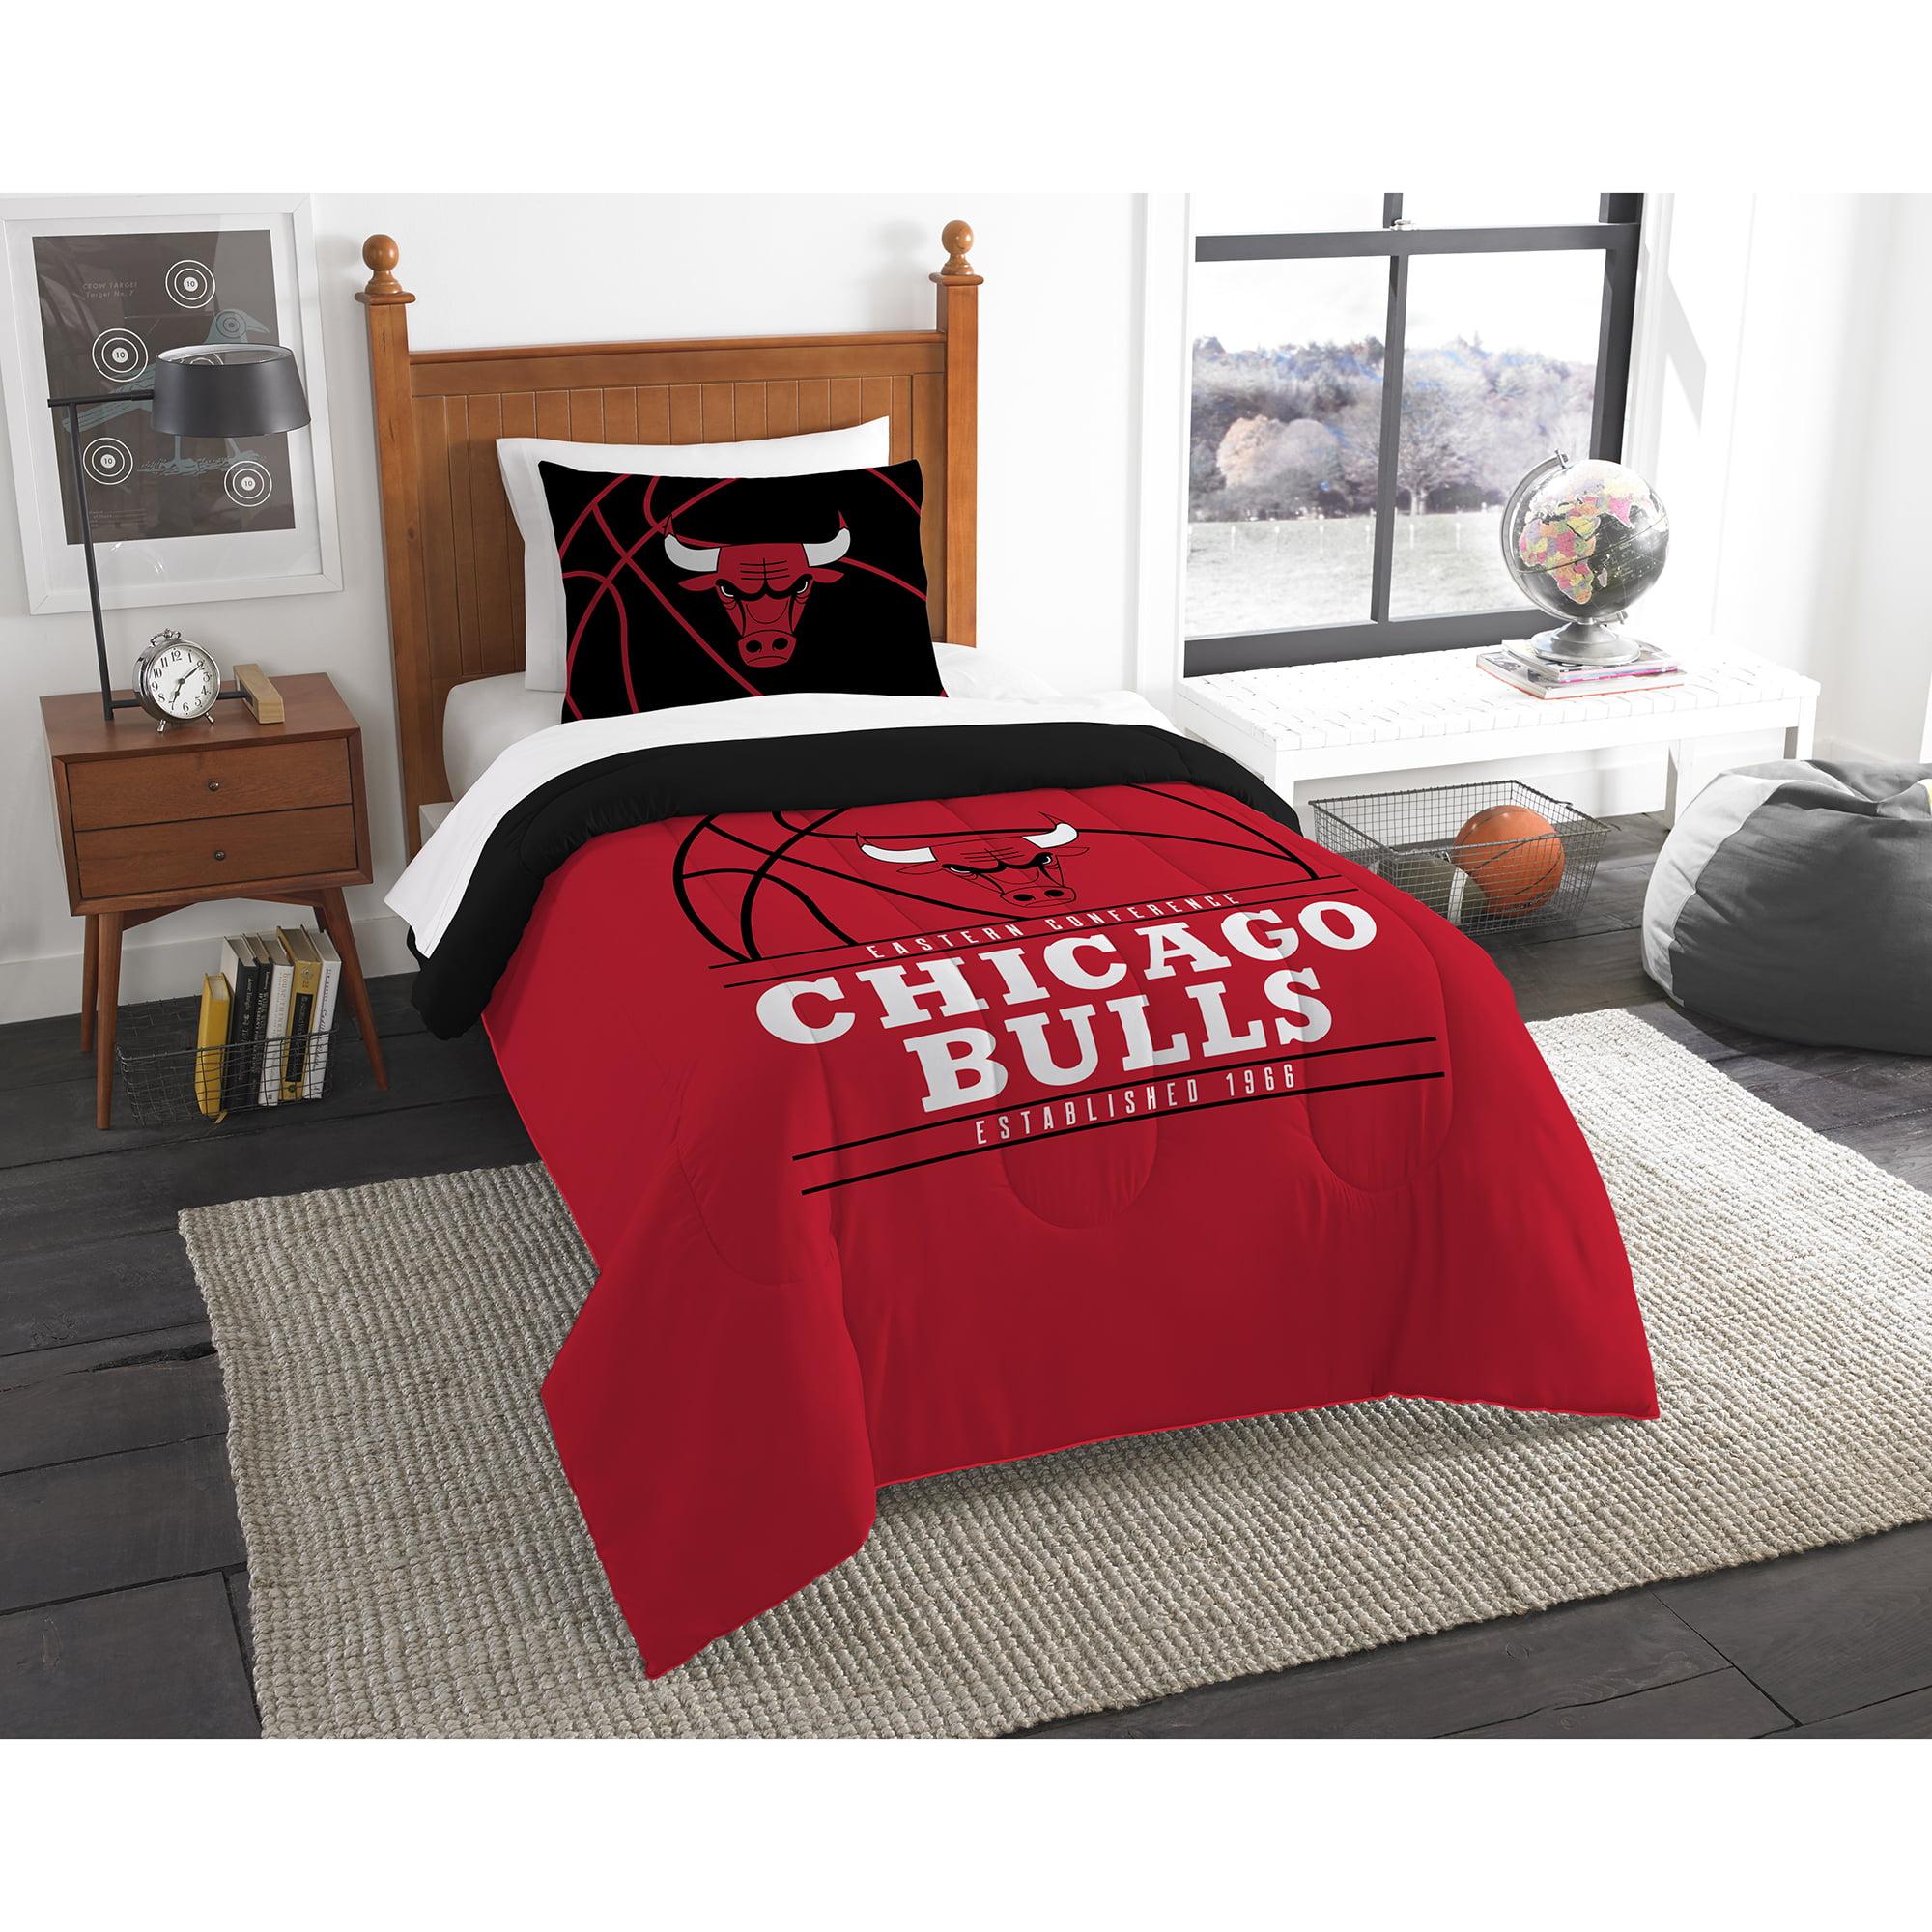 Nba Chicago Bulls Reverse Slam Bedding Comforter Set Walmart Com Walmart Com